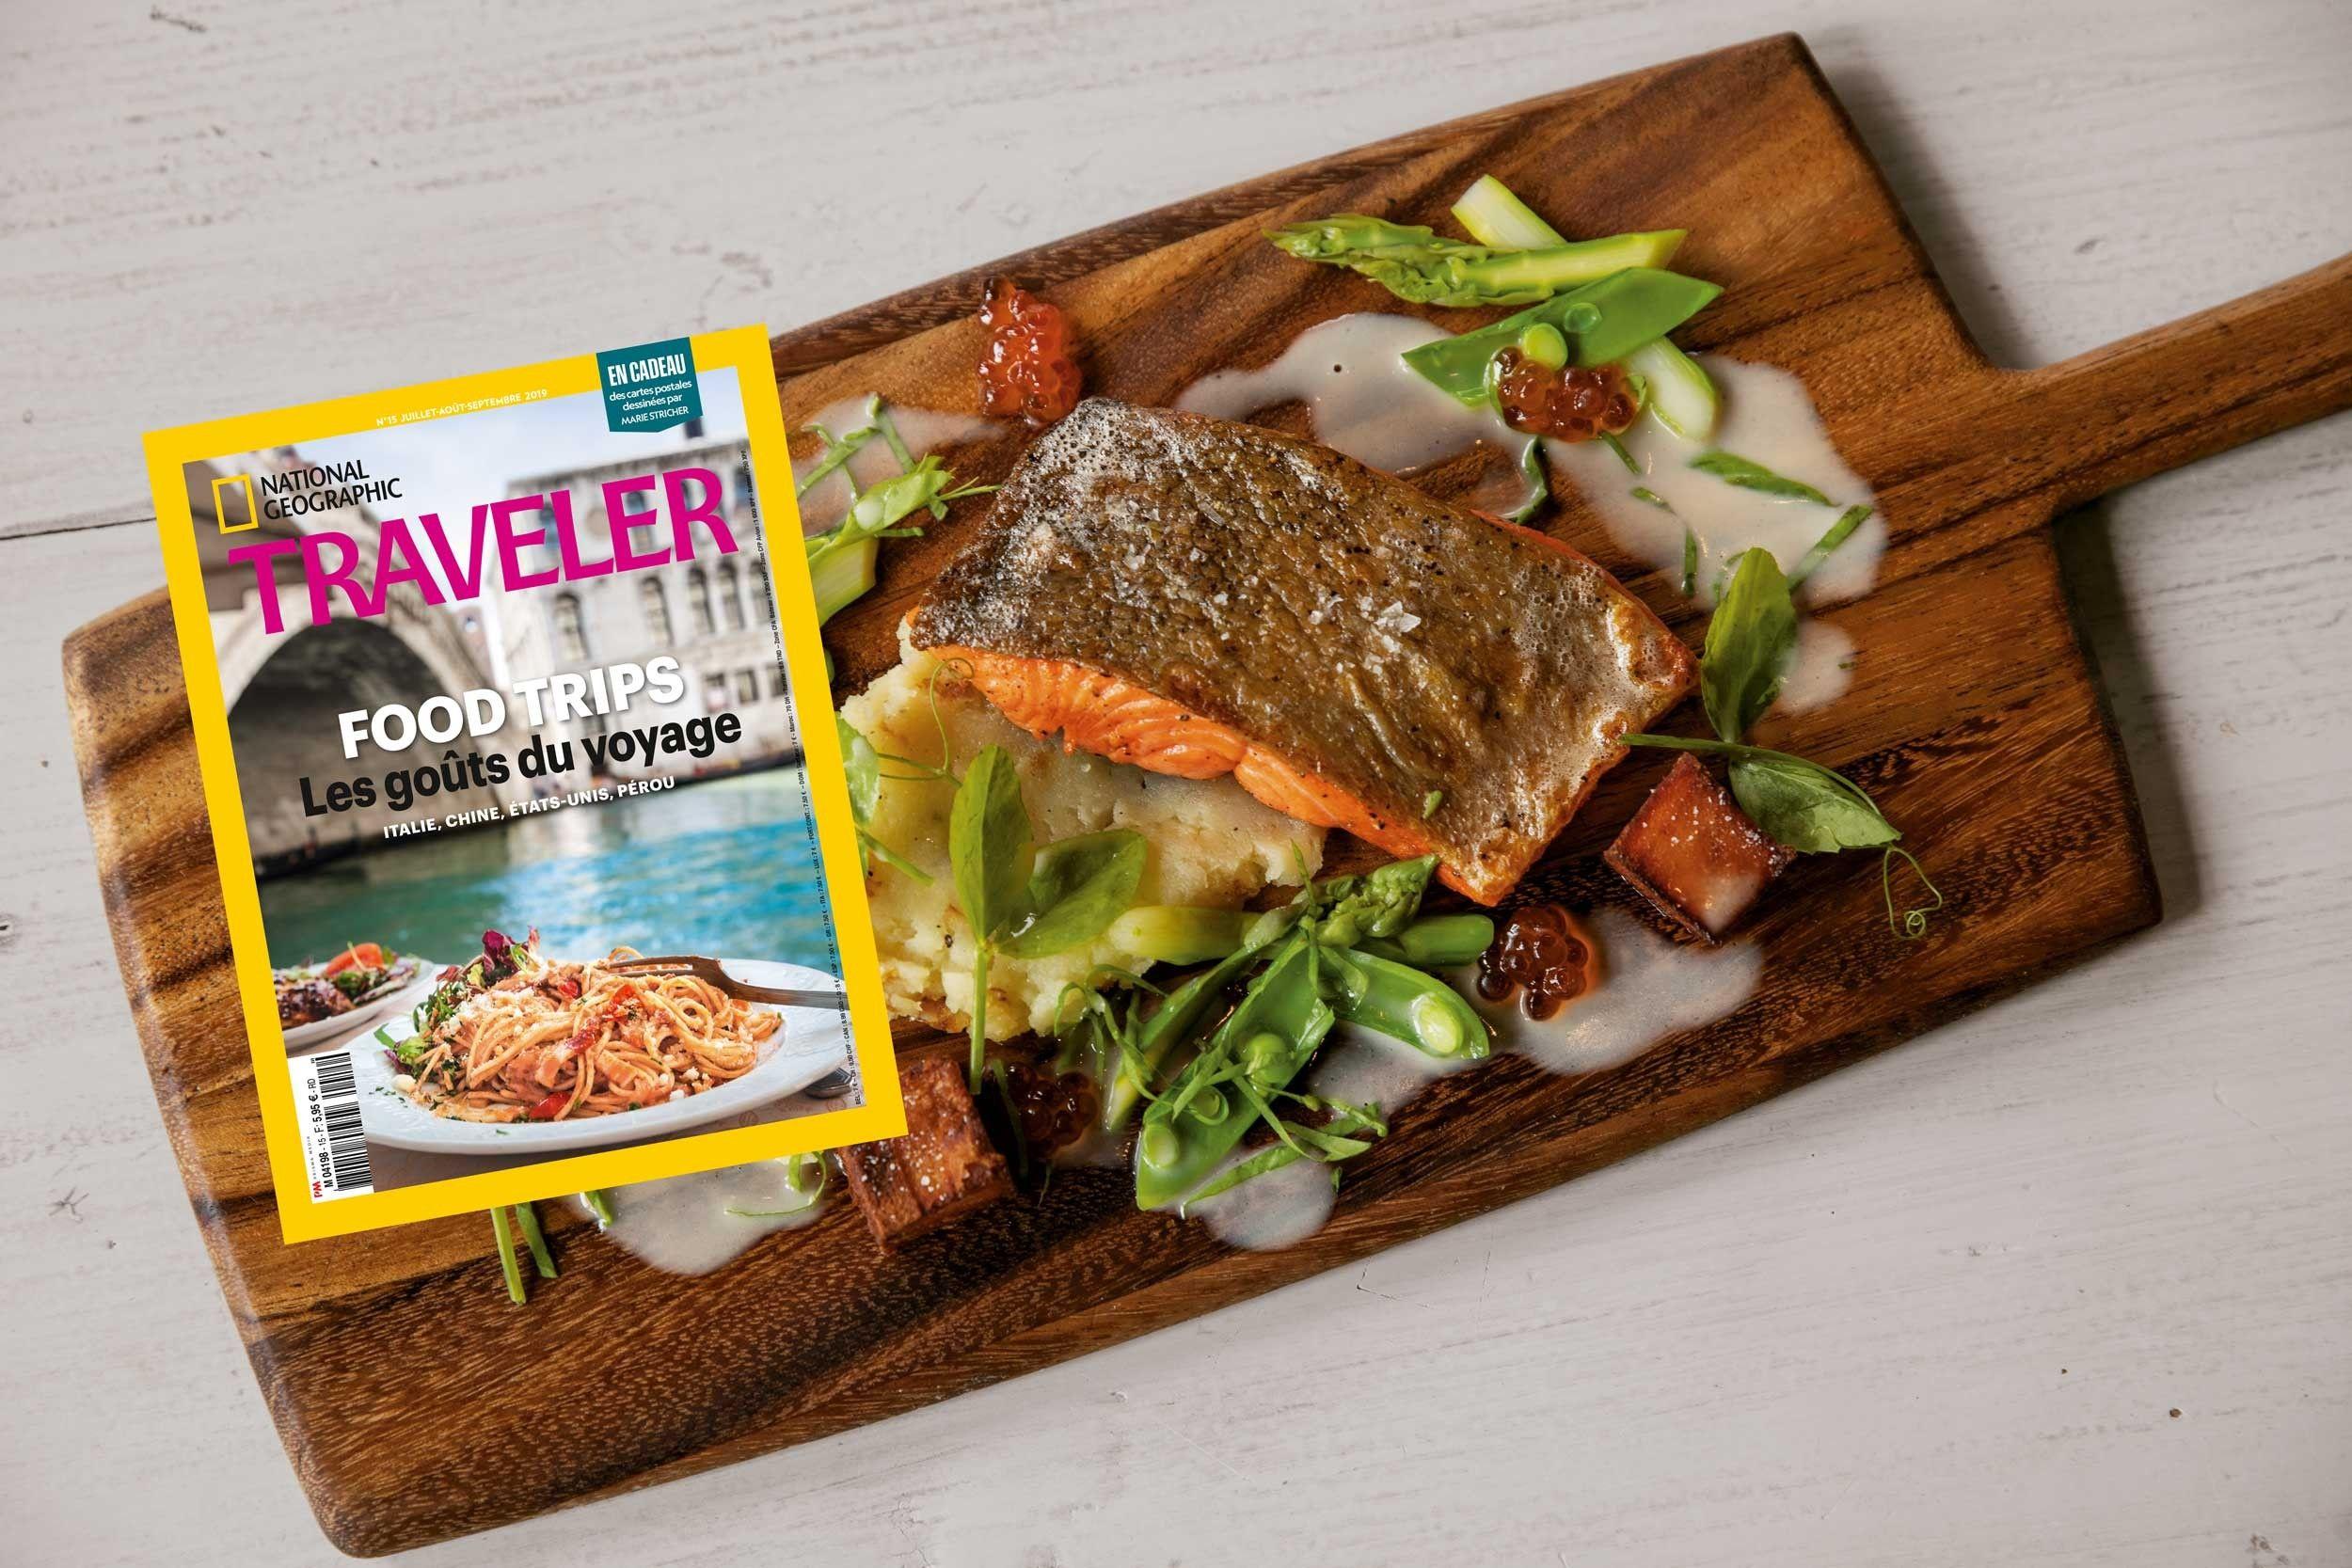 Sommaire du magazine Traveler n° 15 : Les goûts du voyage | National Geographic